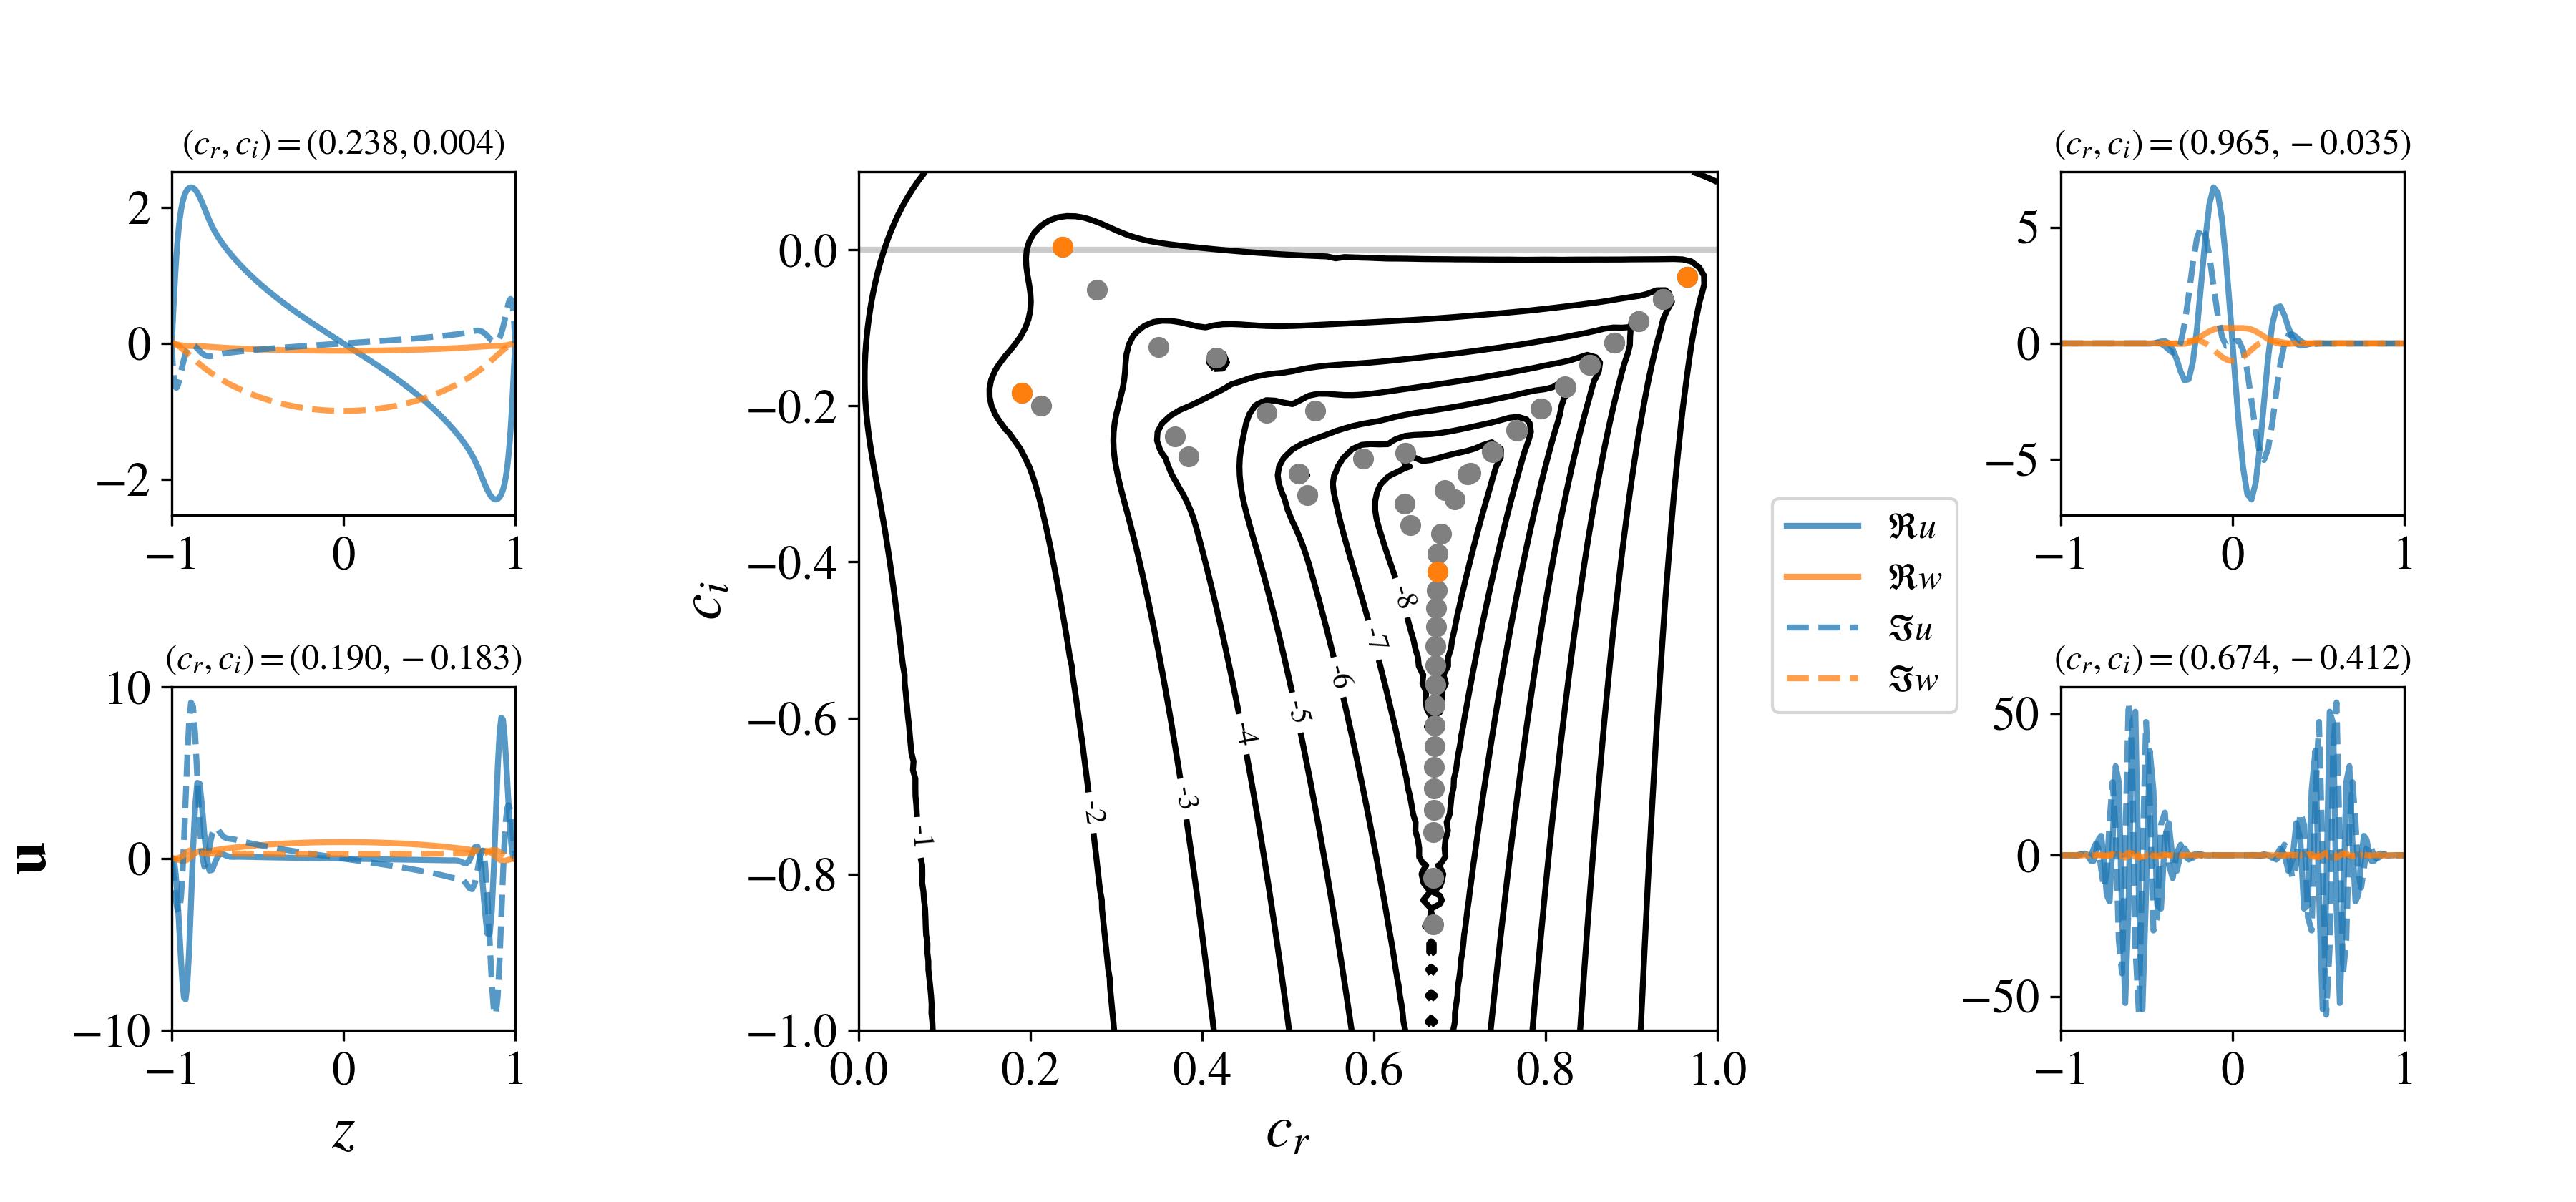 Orr-Sommerfeld pseudospectra with eigentools